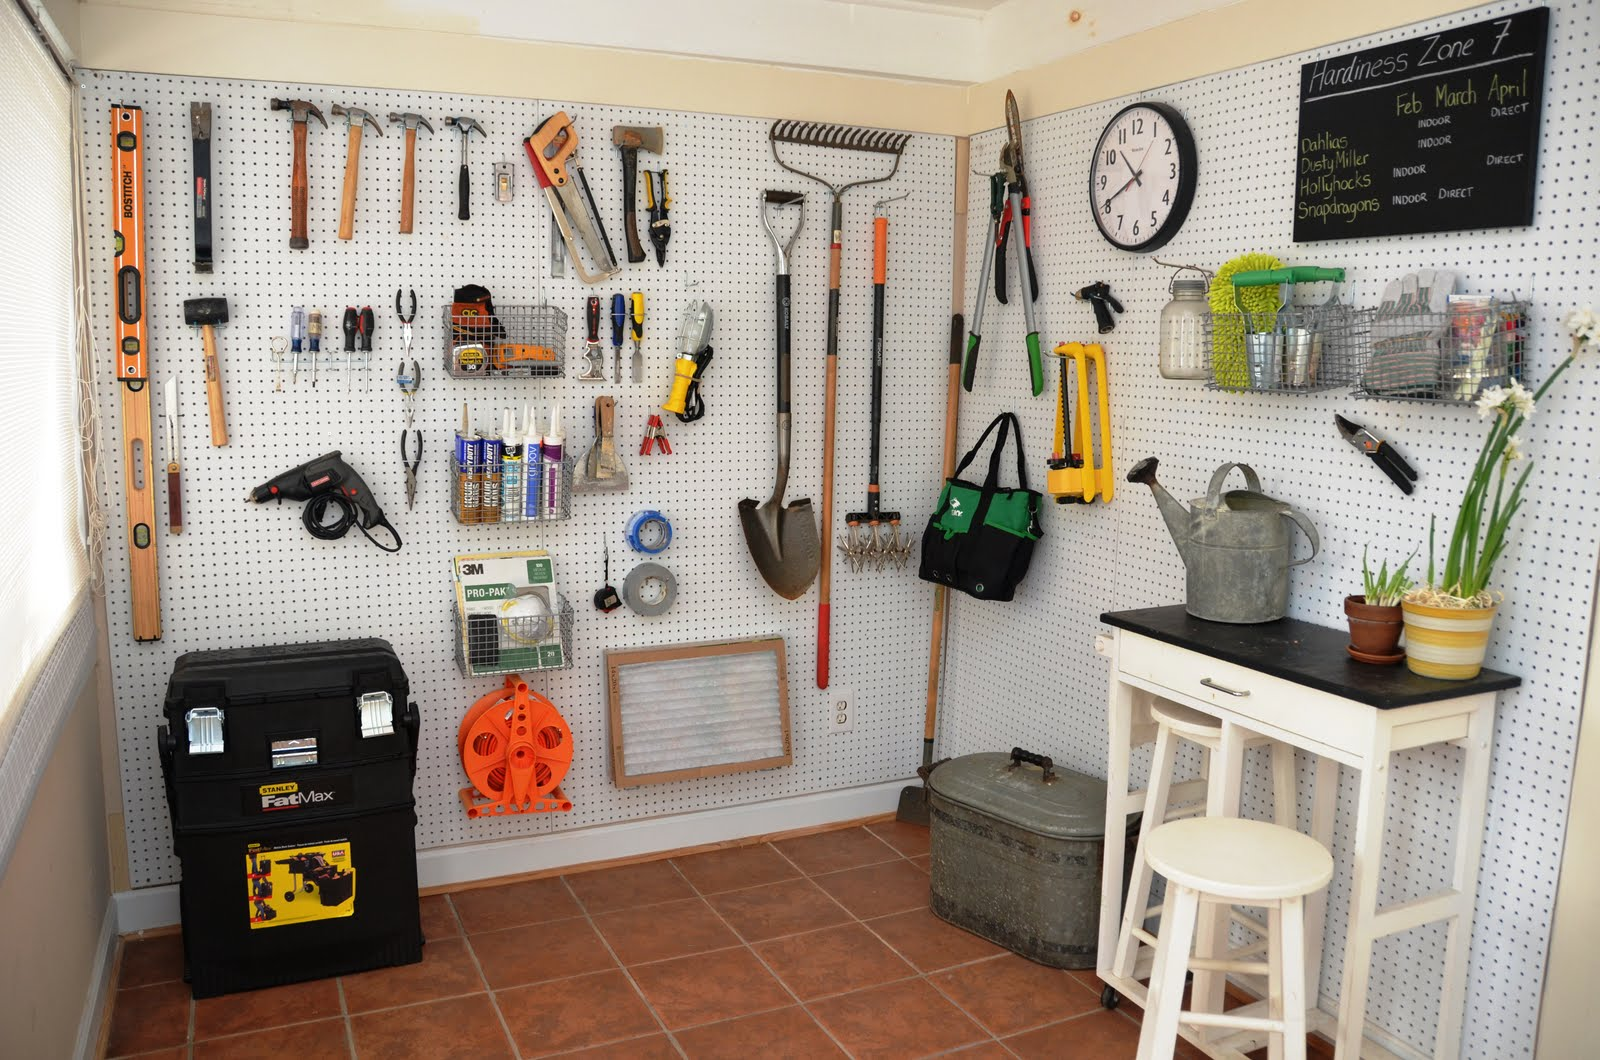 2015 room layout tool - Room Layout Tool